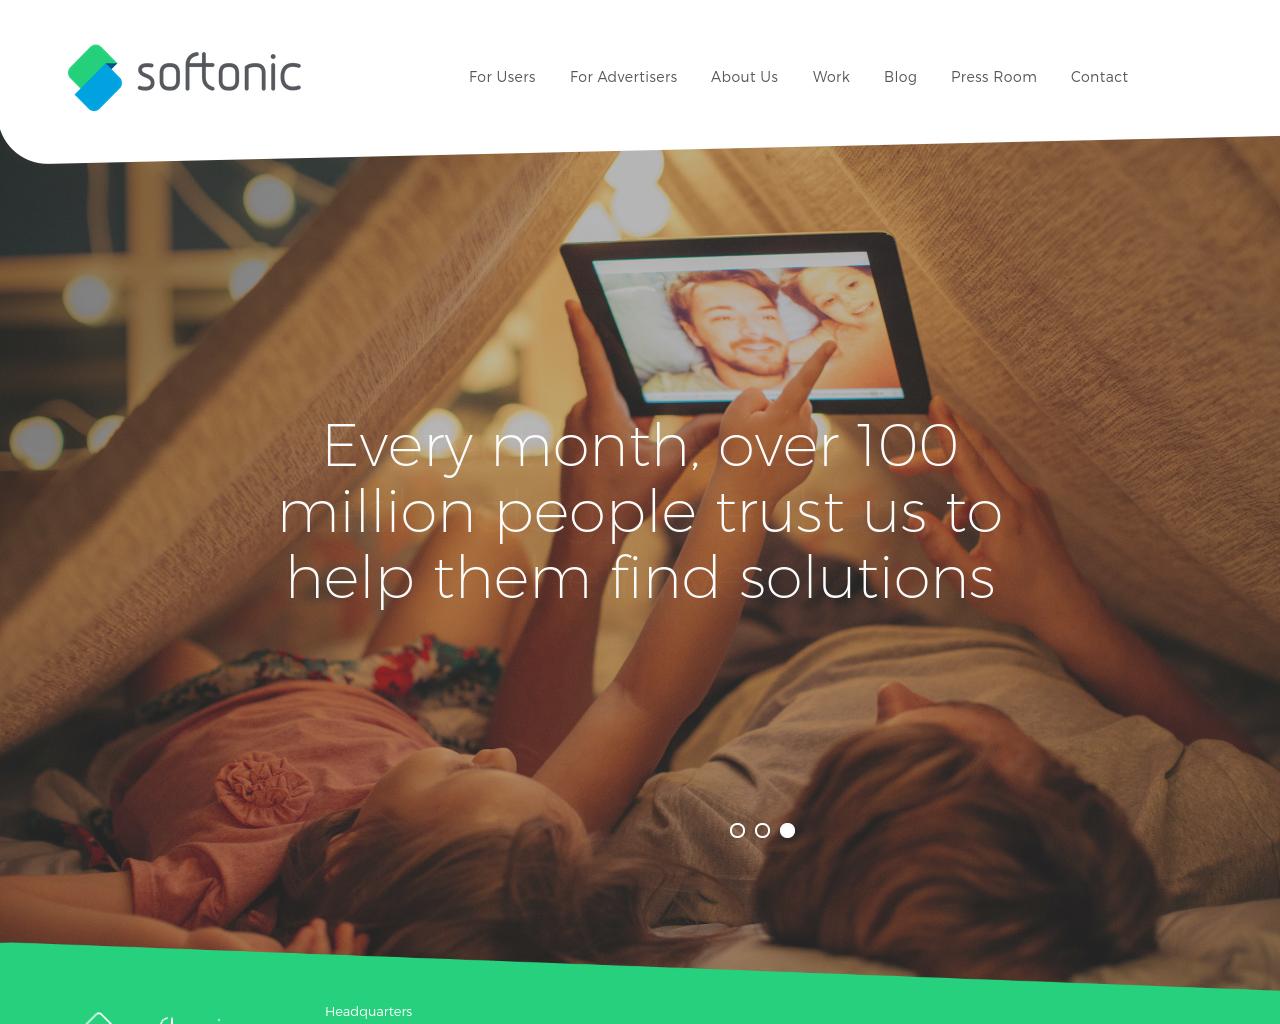 Softonic-Advertising-Reviews-Pricing